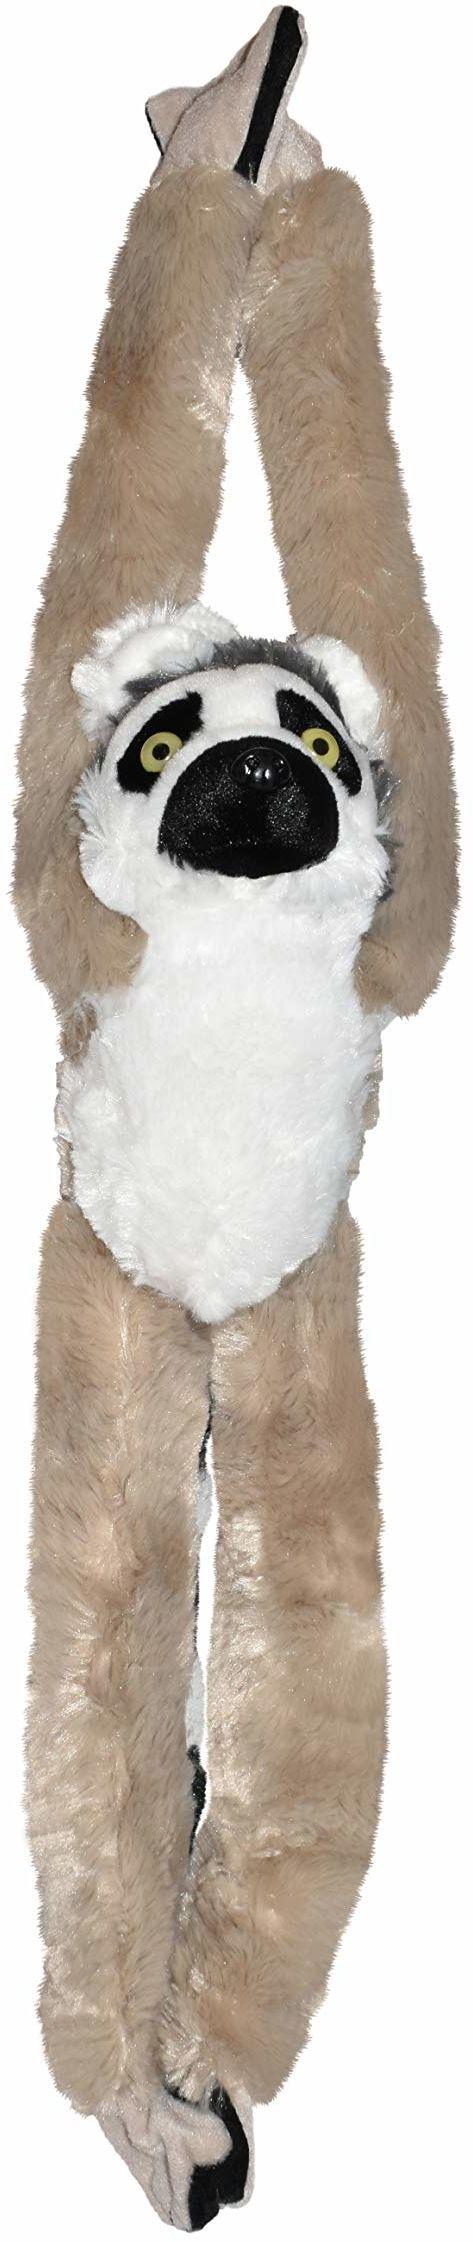 Wild Republic 15261 - Hanging Monkey Katta Lemur pluszowa małpka, 51 cm